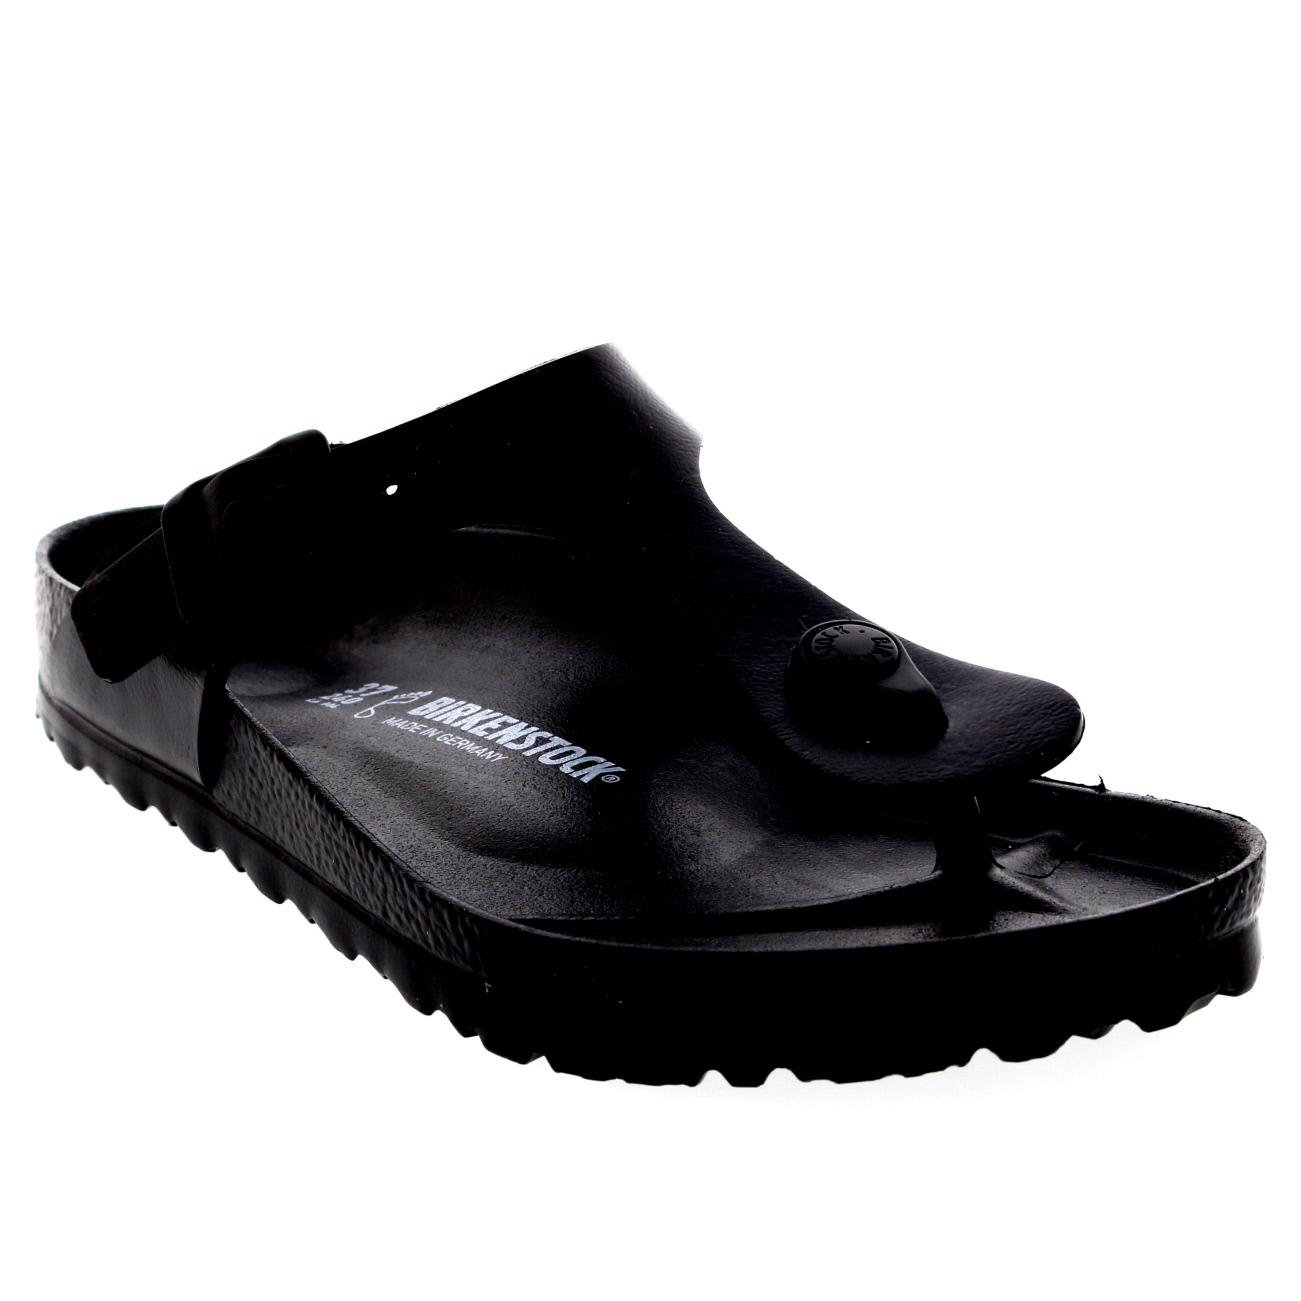 Unisex-Adults-Birkenstock-Gizeh-Summer-EVA-Toe-Post-Beach-Flat-Sandals-All-Sizes thumbnail 15